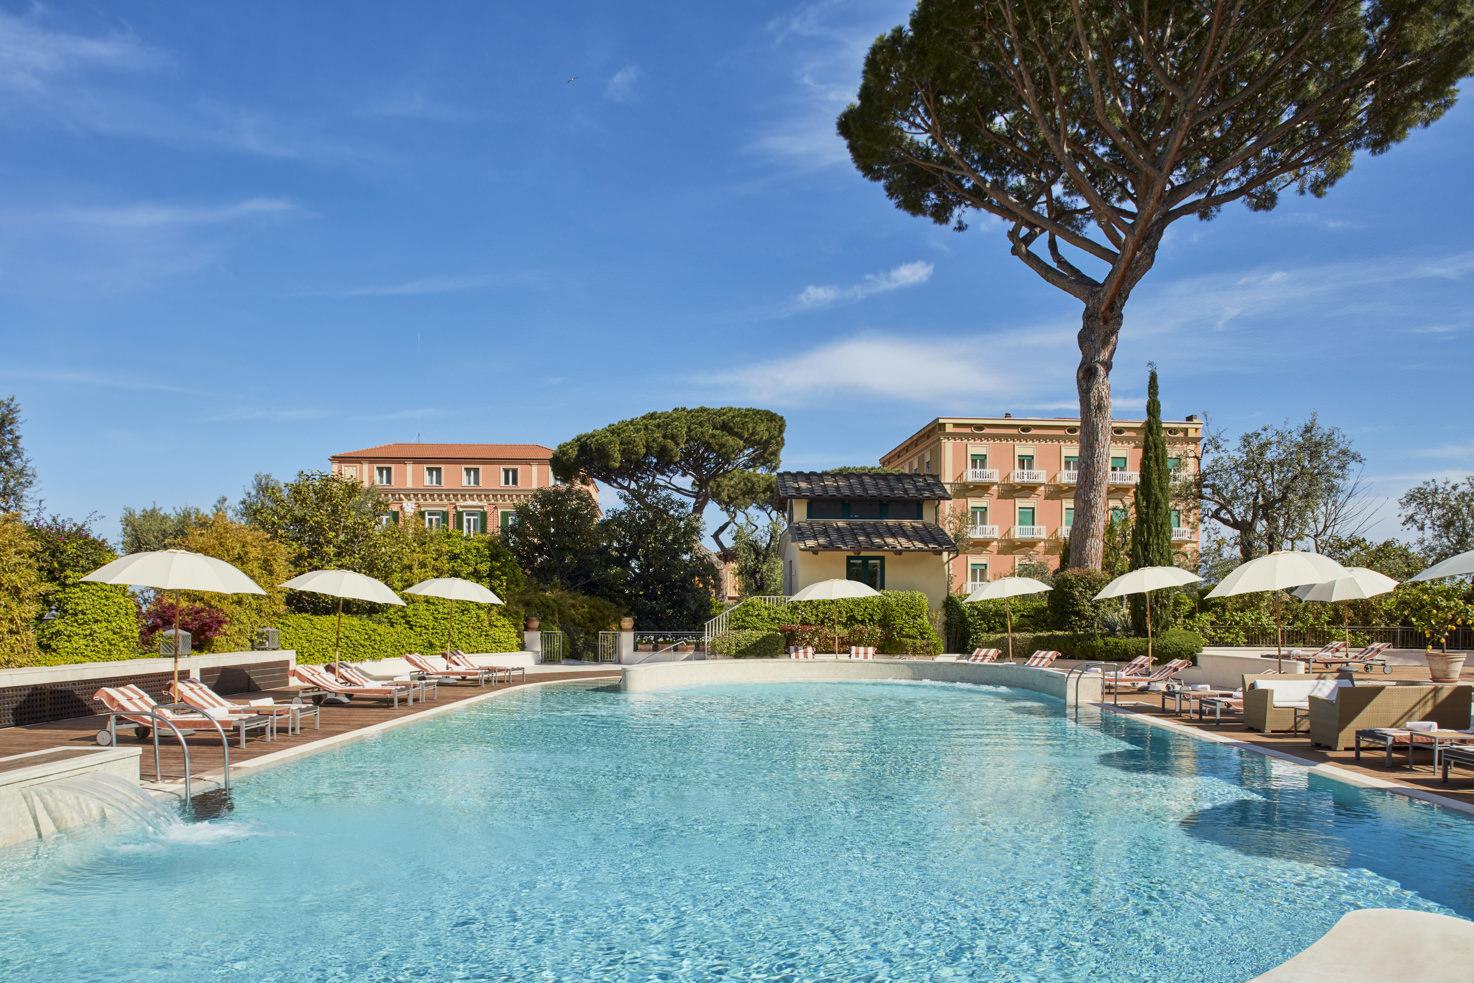 Garden pool of Hotel Excelsior Vittoria